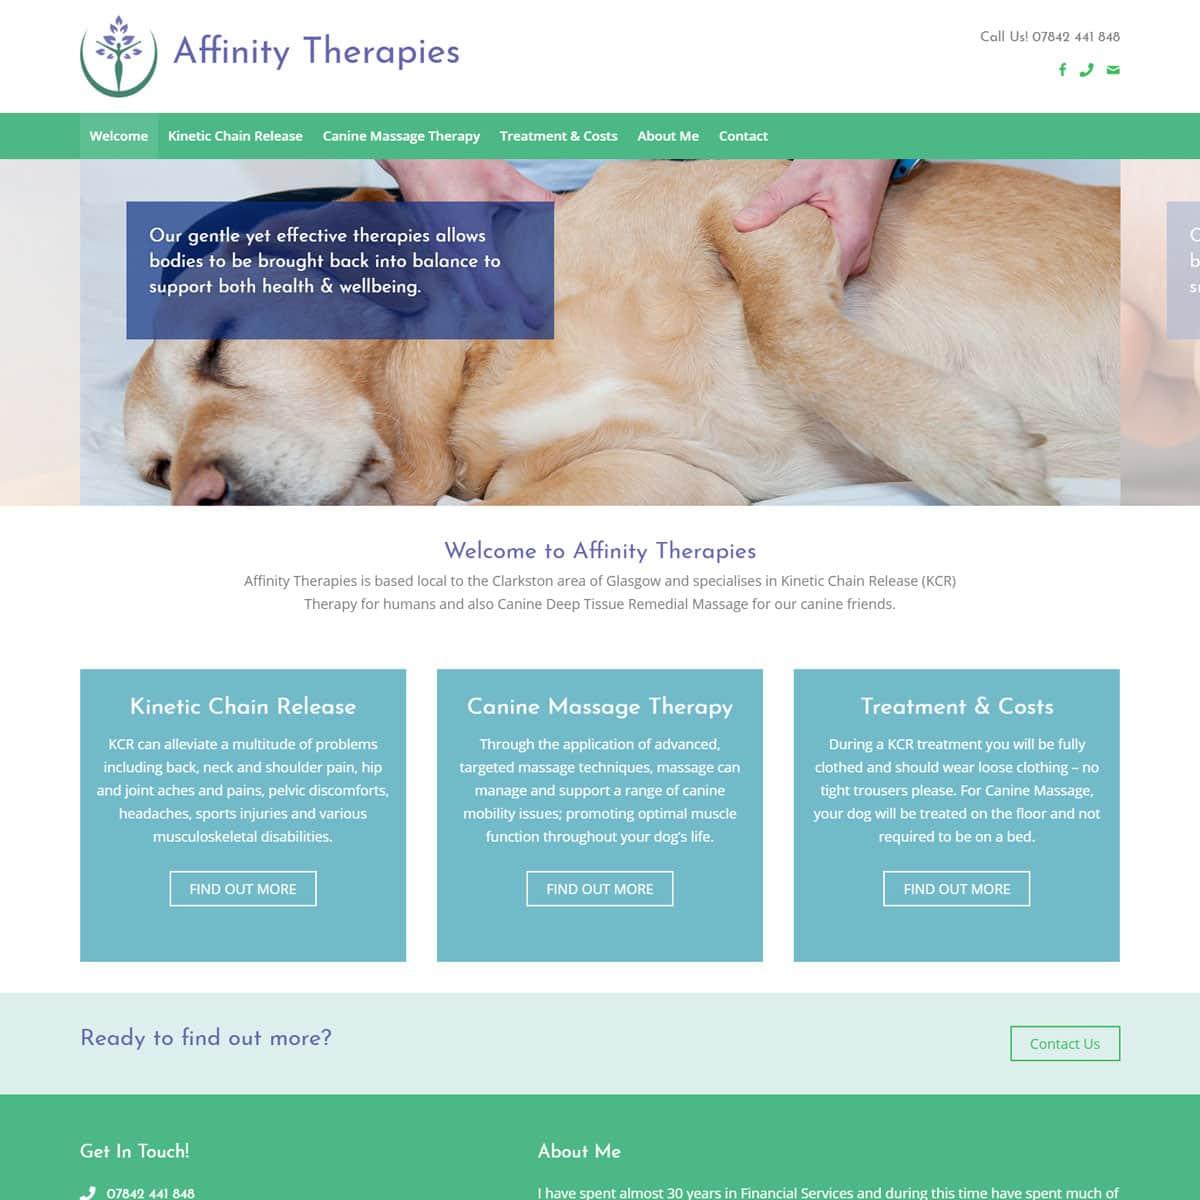 affinitytherapies